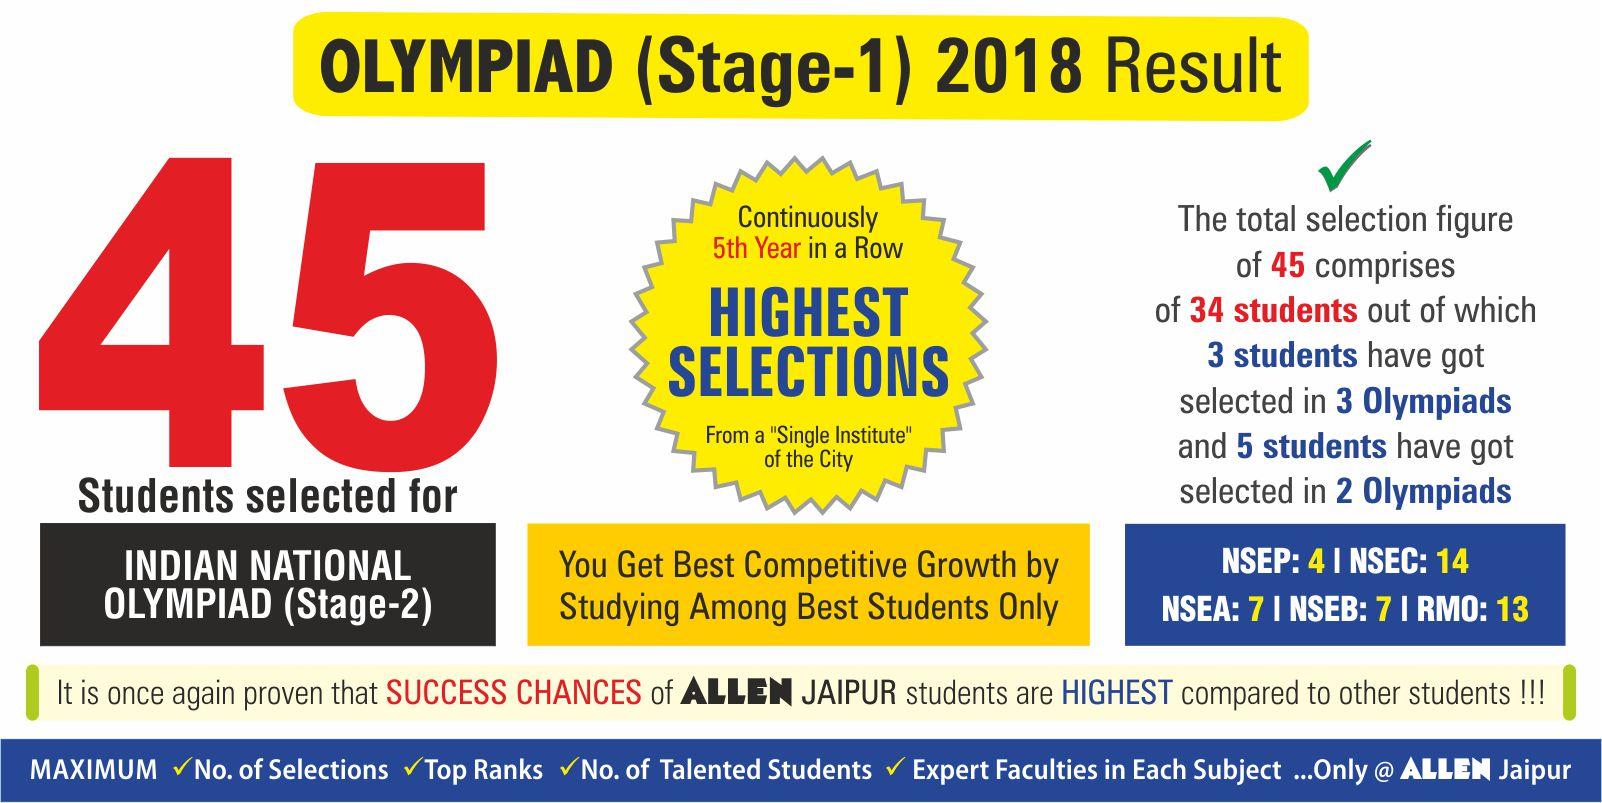 OLYMPIAD (STAGE-1) 2018